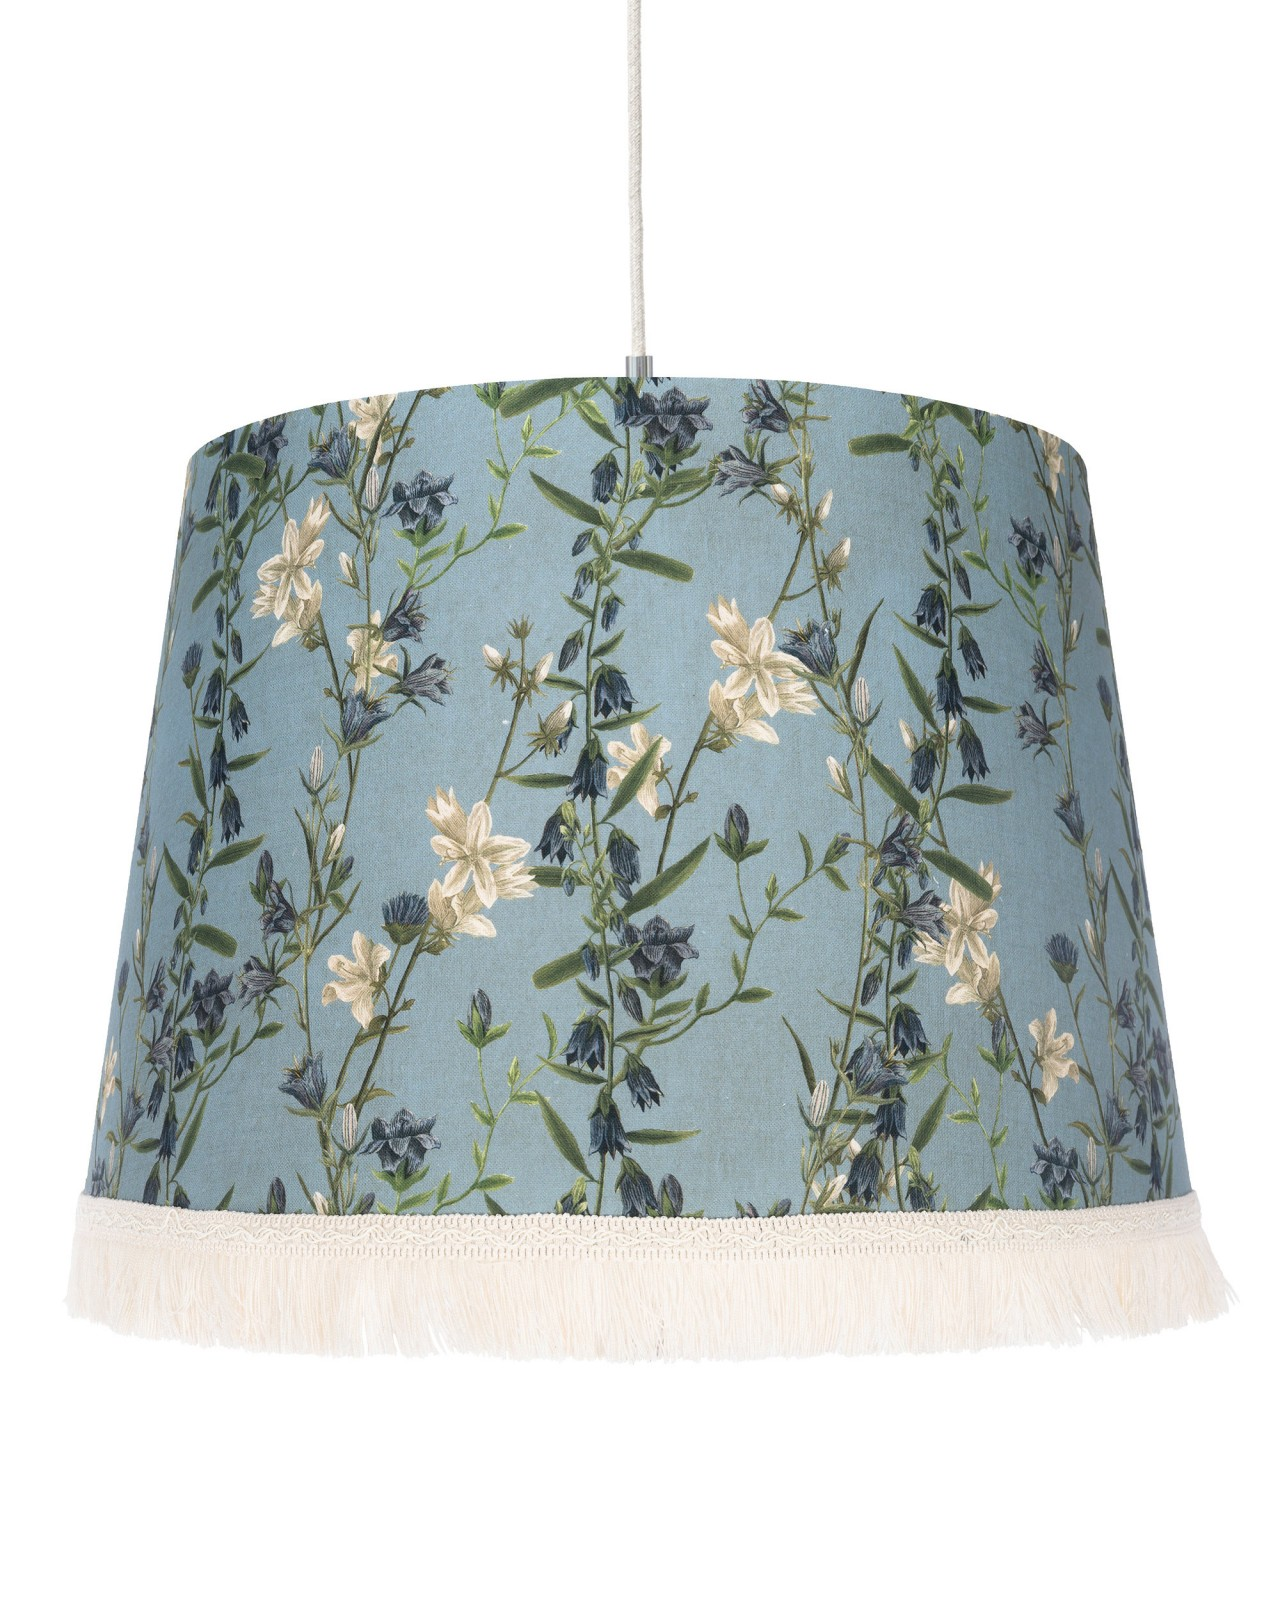 DELICATE BLOOM Pendant Lamp